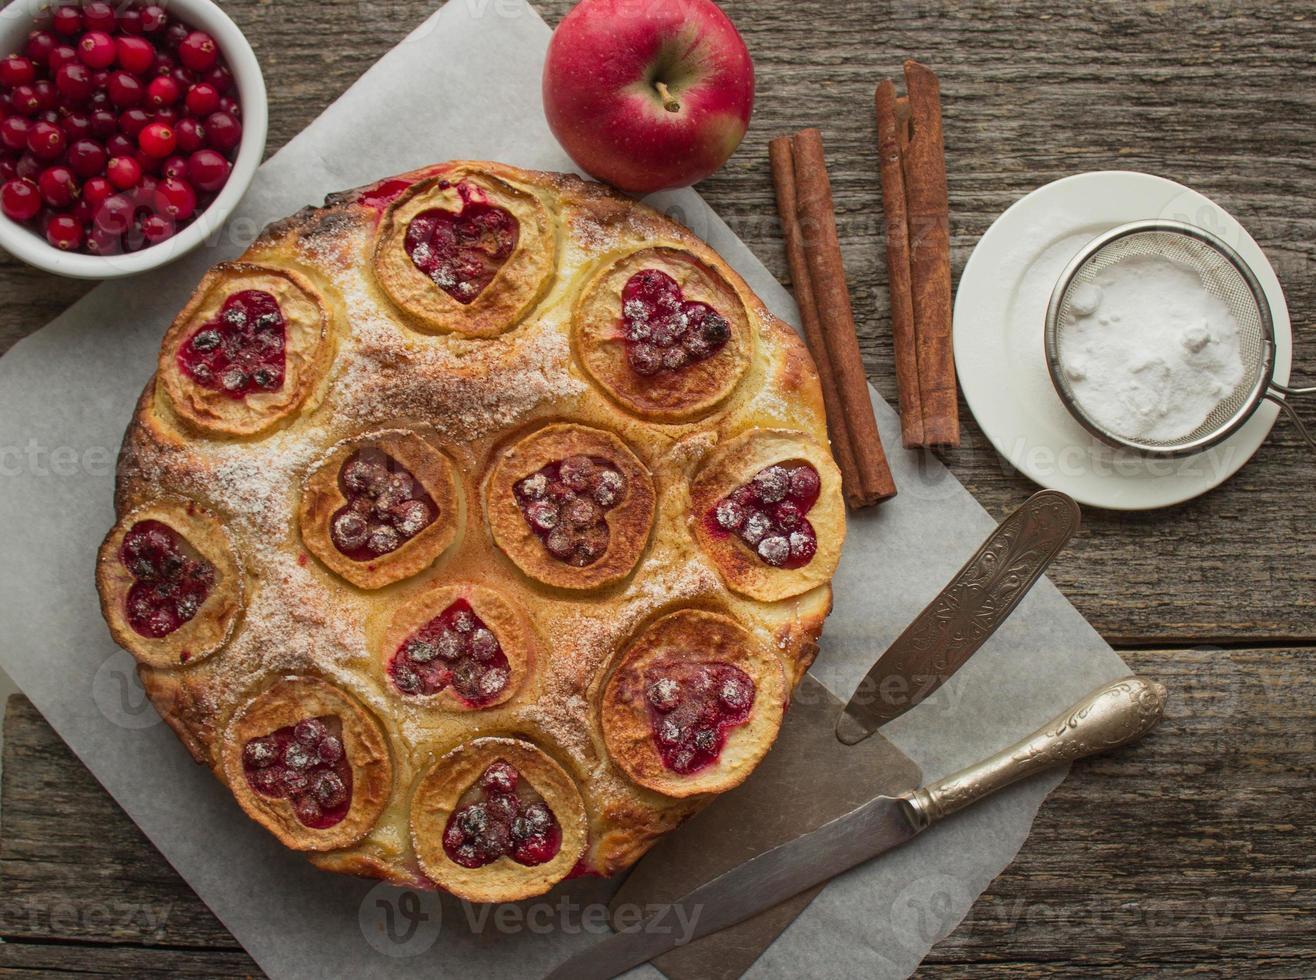 torta com maçãs, cranberries e canela foto